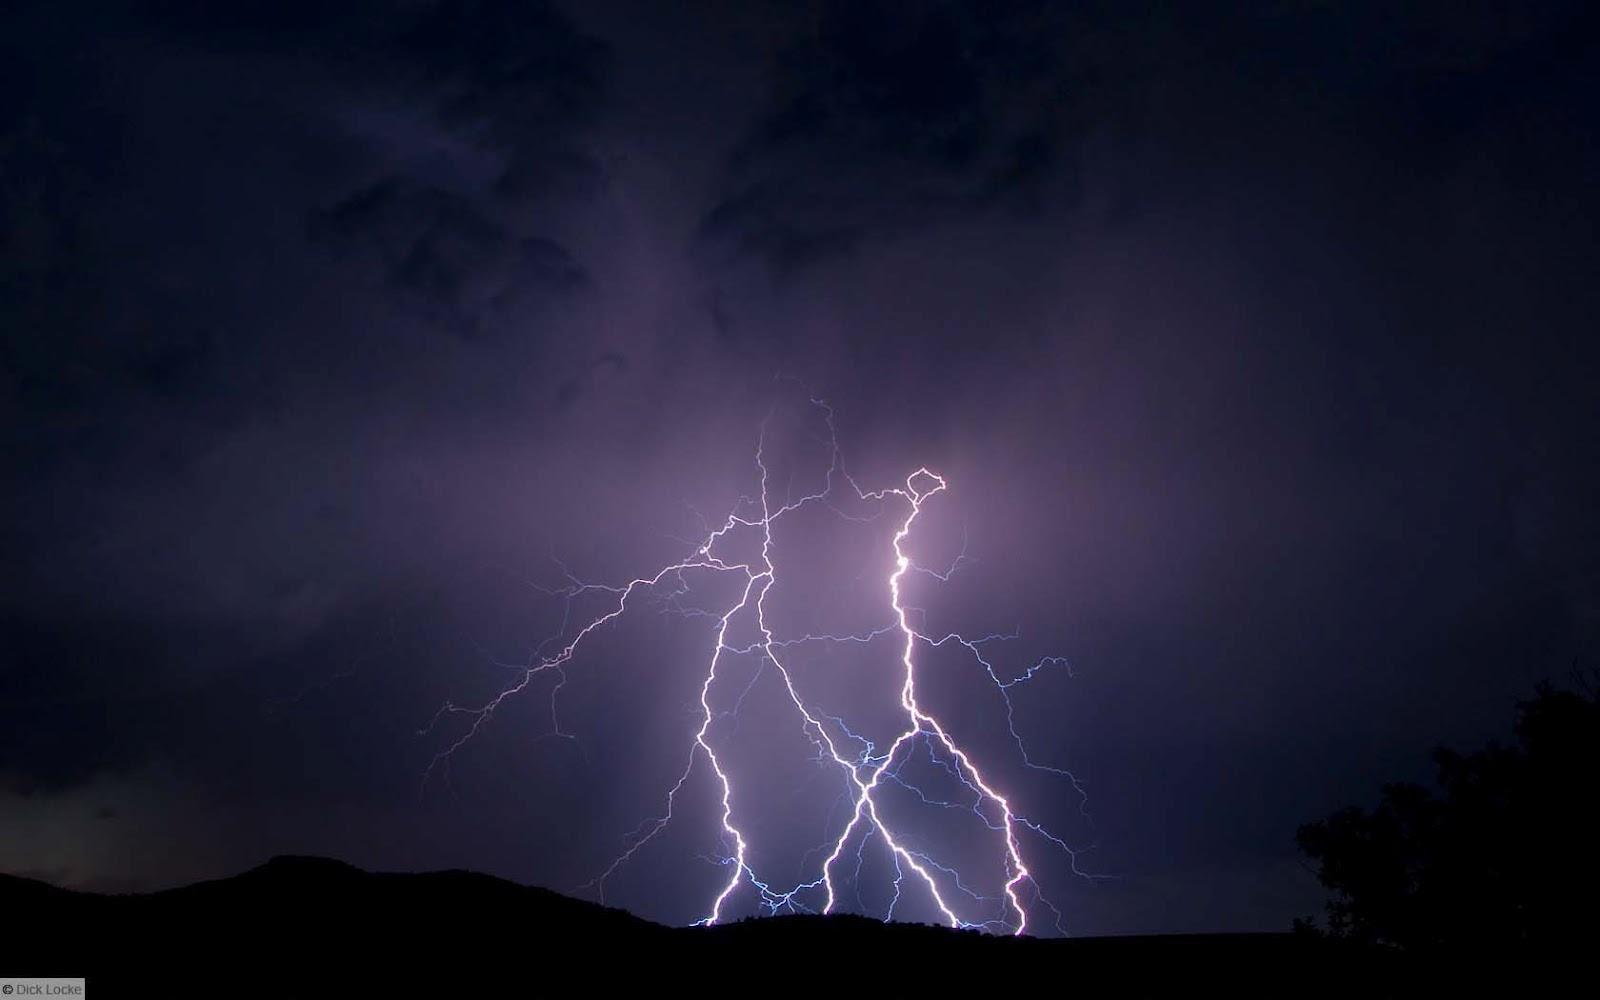 http://4.bp.blogspot.com/-o7jB3rkAb_w/T1bOHQJVfnI/AAAAAAAAIto/XK54qkq2-Ks/s1600/Lightning_bolts_thunder.jpg